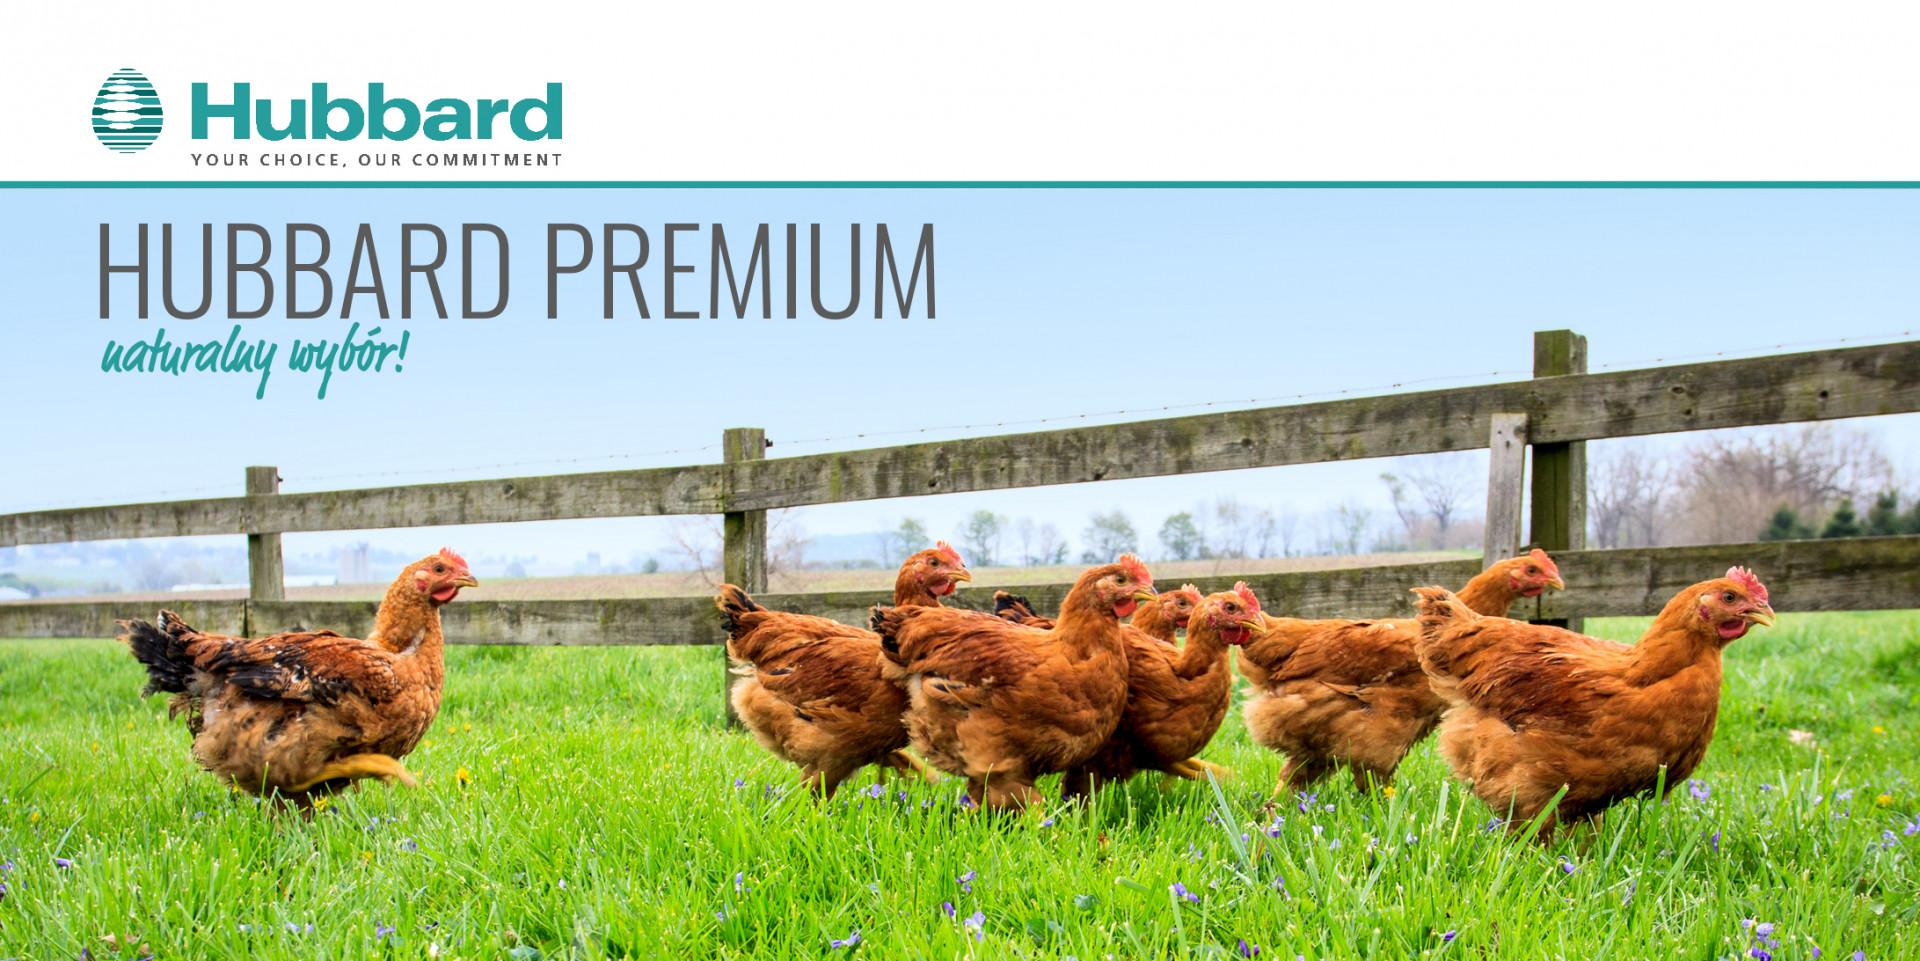 Hubbard Premium